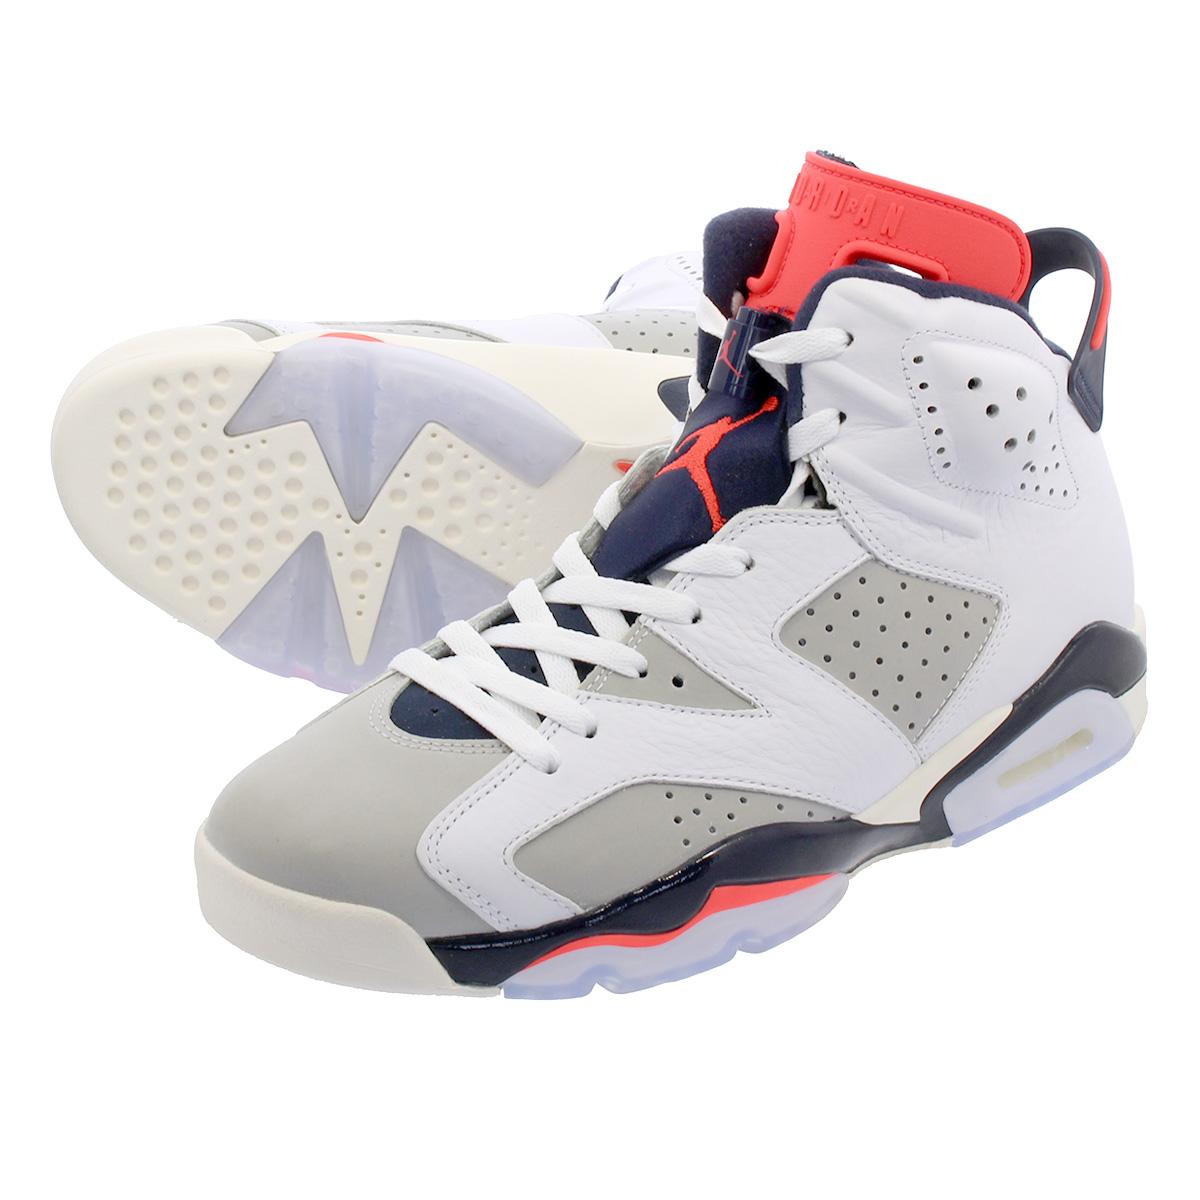 5eced4c99778ad NIKE AIR JORDAN 6 RETRO Nike Air Jordan 6 nostalgic WHITE INFRARED 23 GREY SAIL  384